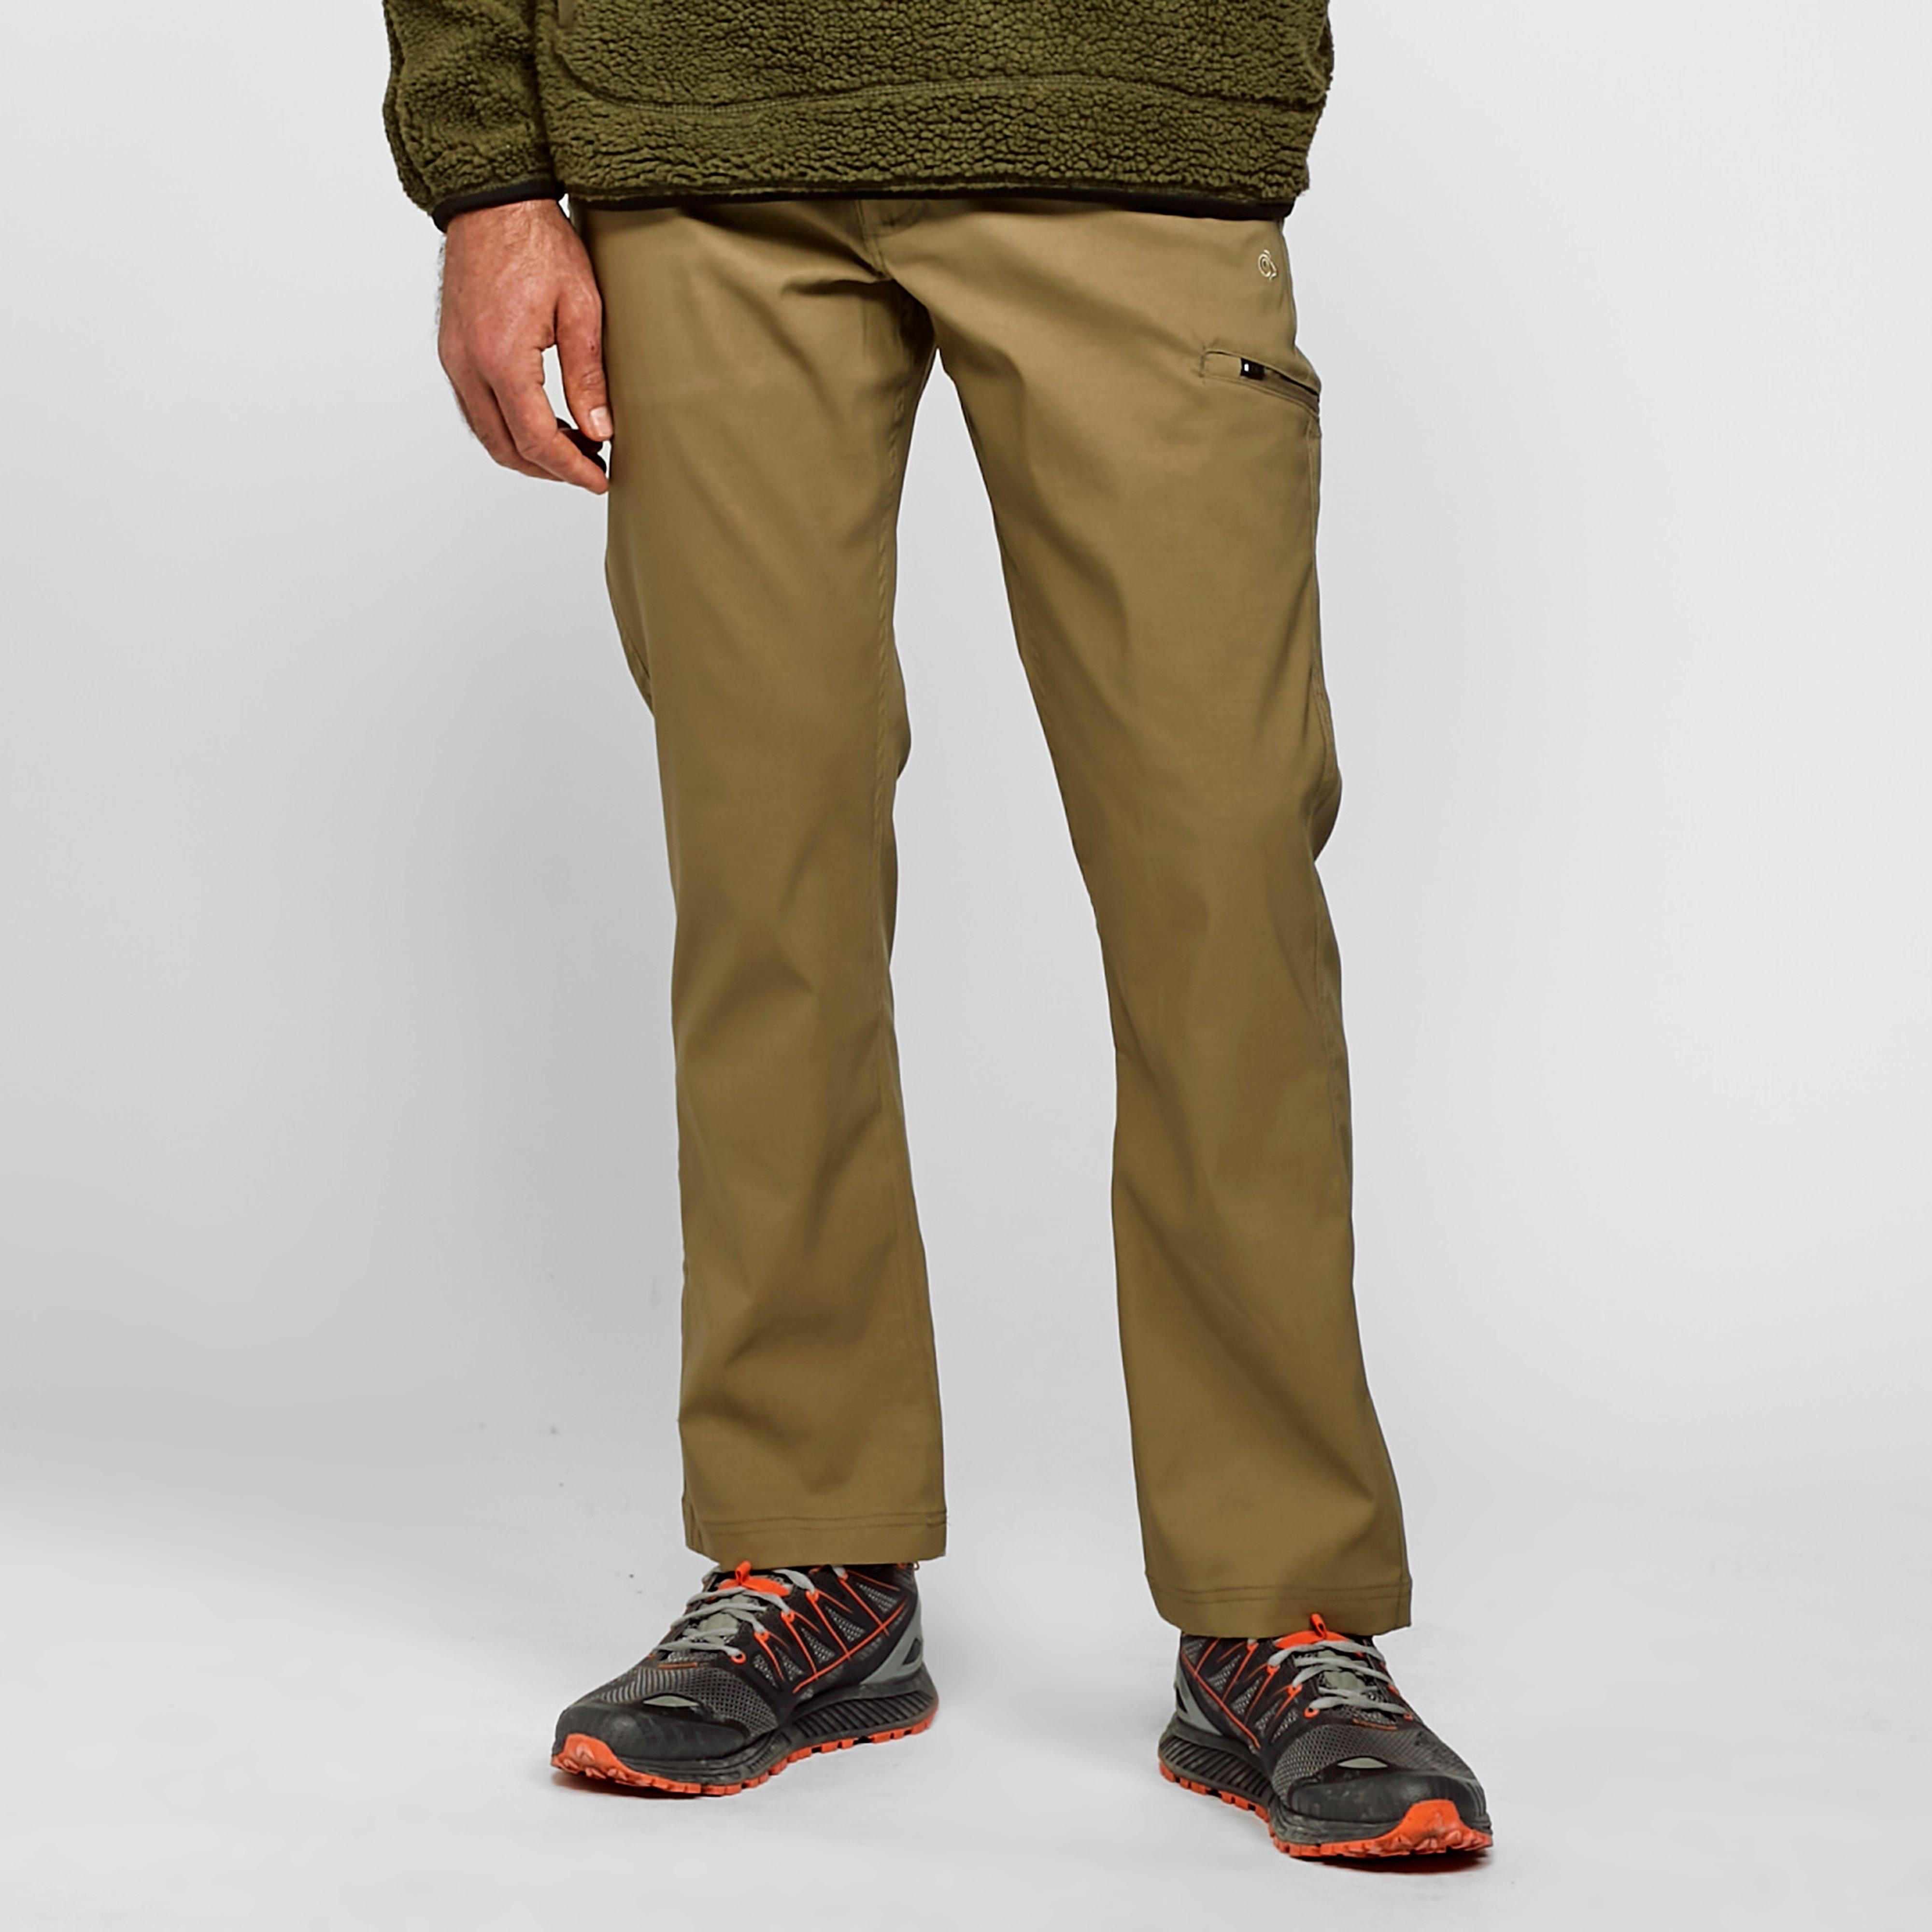 Craghoppers Mens Kiwi Pro Stretch Trousers (short) - Beige/bei  Beige/bei